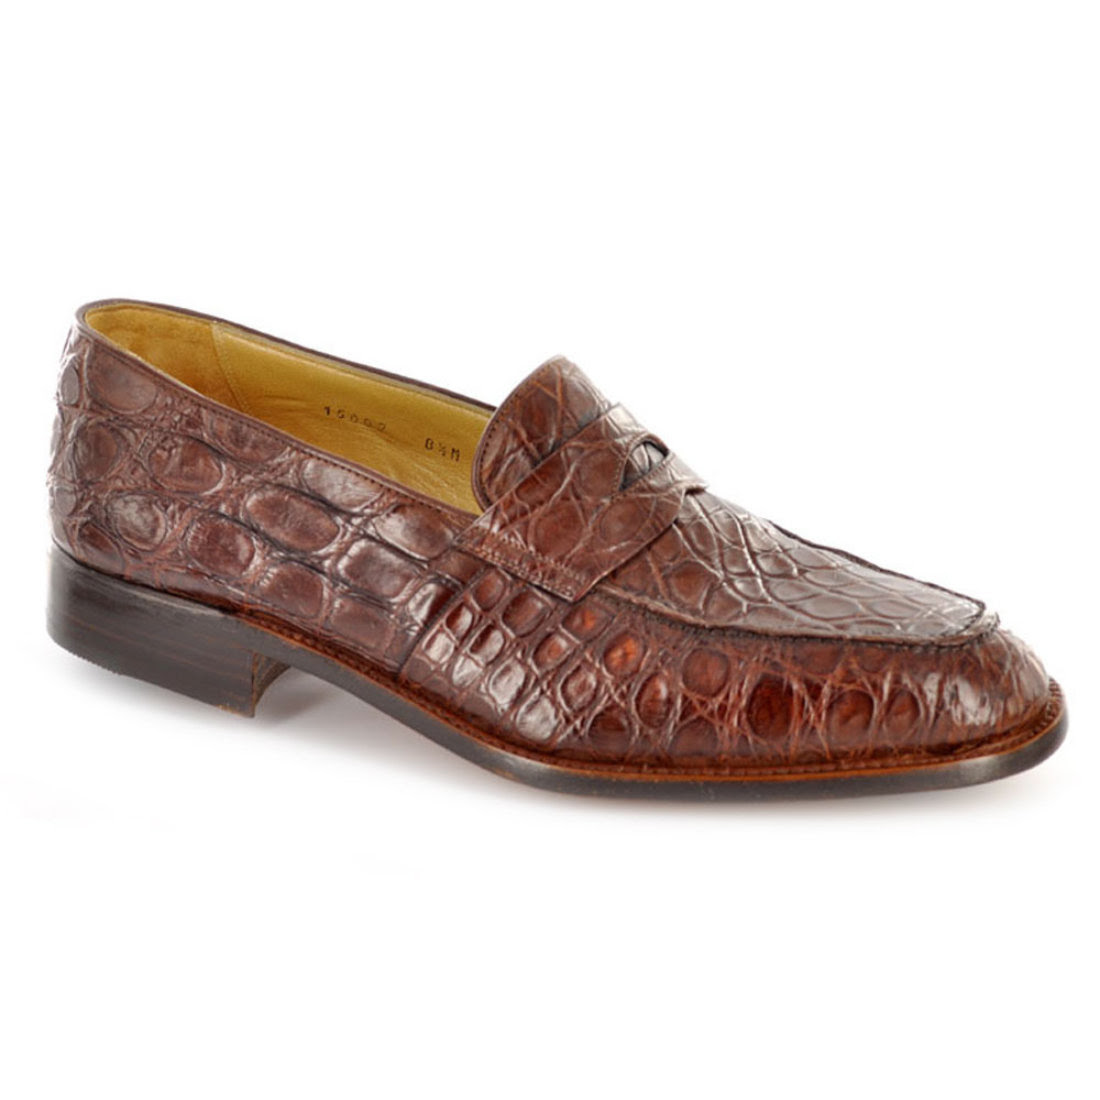 Gravati Men's Shoes Genuine Crocodile Penny Loafer 15009C ...